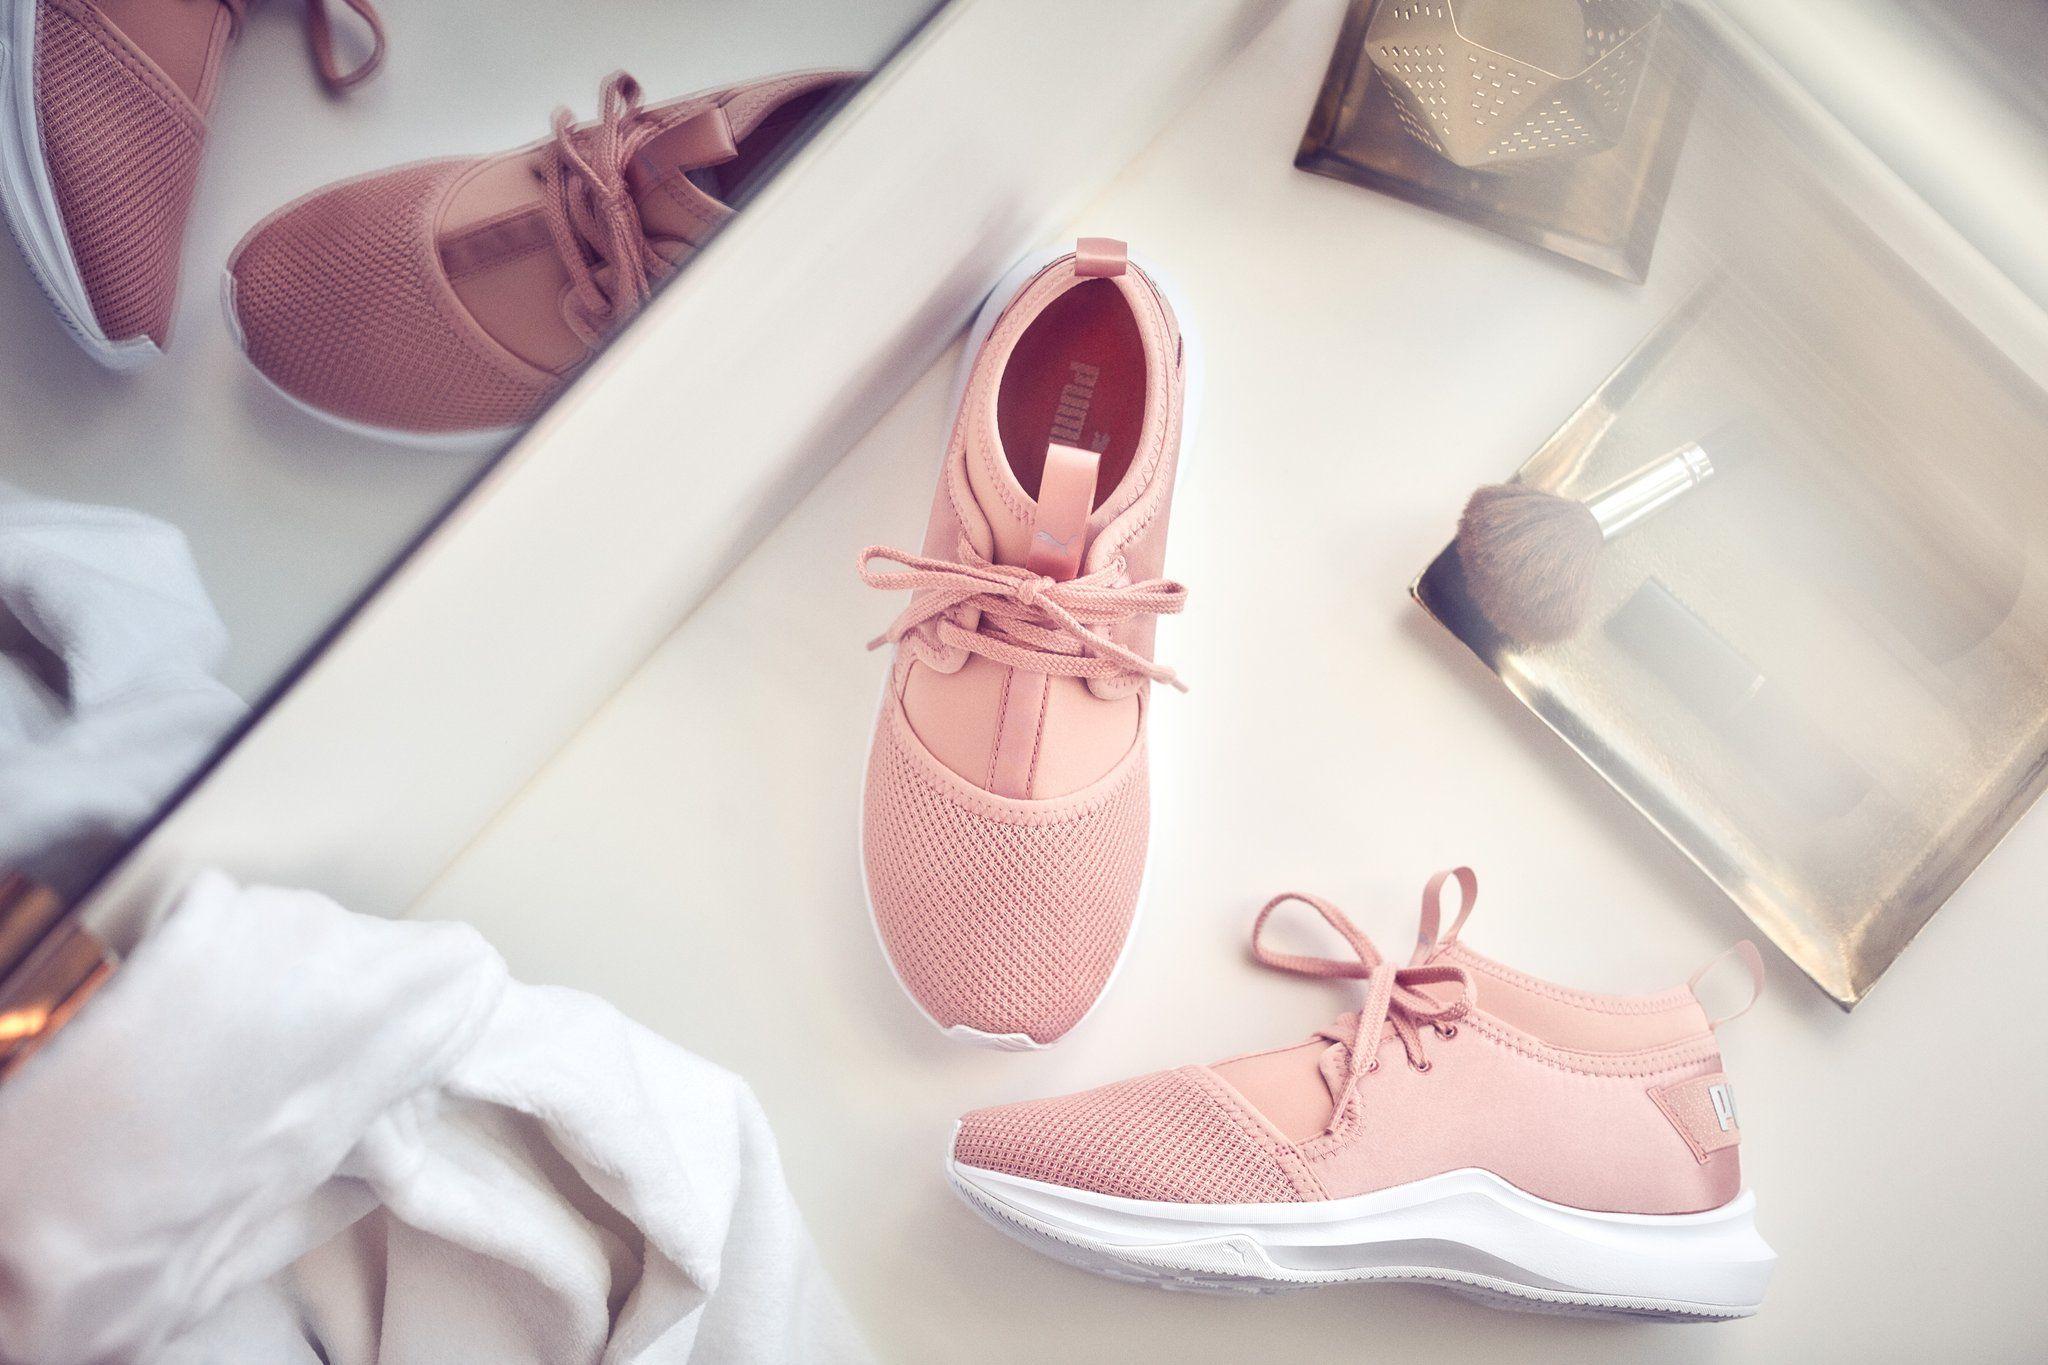 Selena gomez shoes, Puma shoes outfit